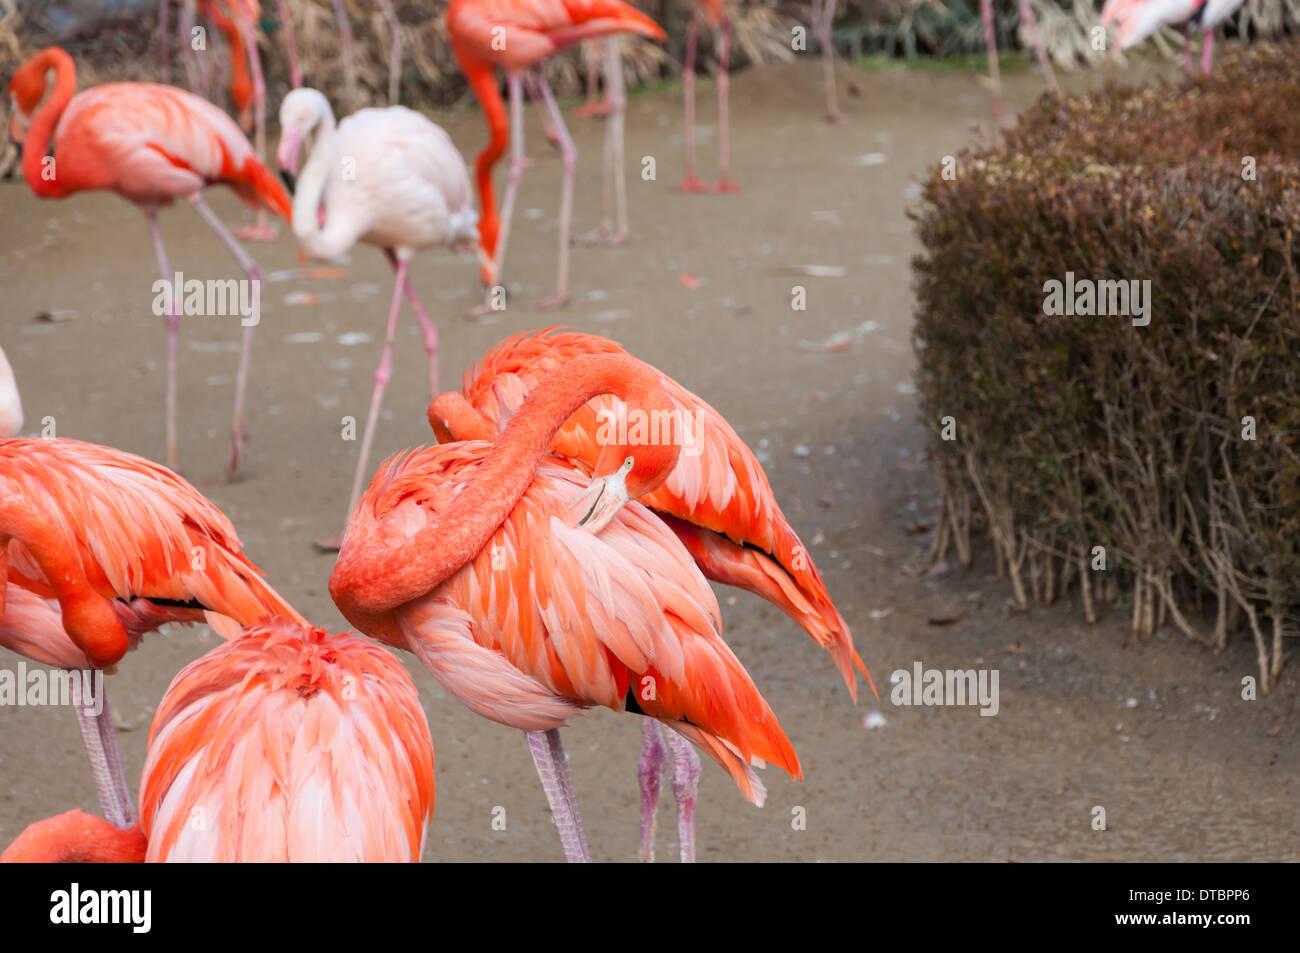 Flamingos at the Seoul Zoo. - Stock Image